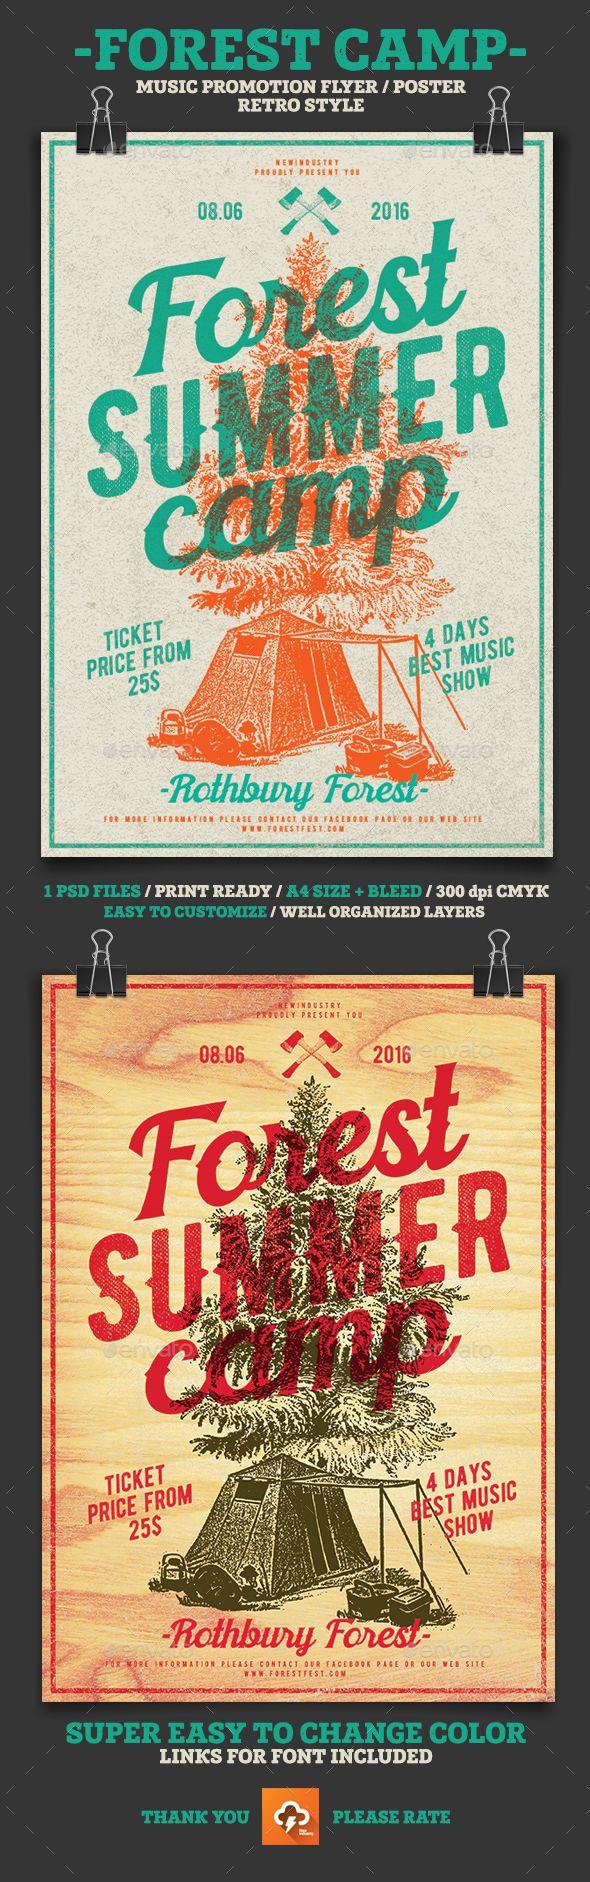 Forest Summer Camp Flyer Template PSD. Download here: http://graphicriver.net/item/forest-summer-camp/15064419?ref=ksioks